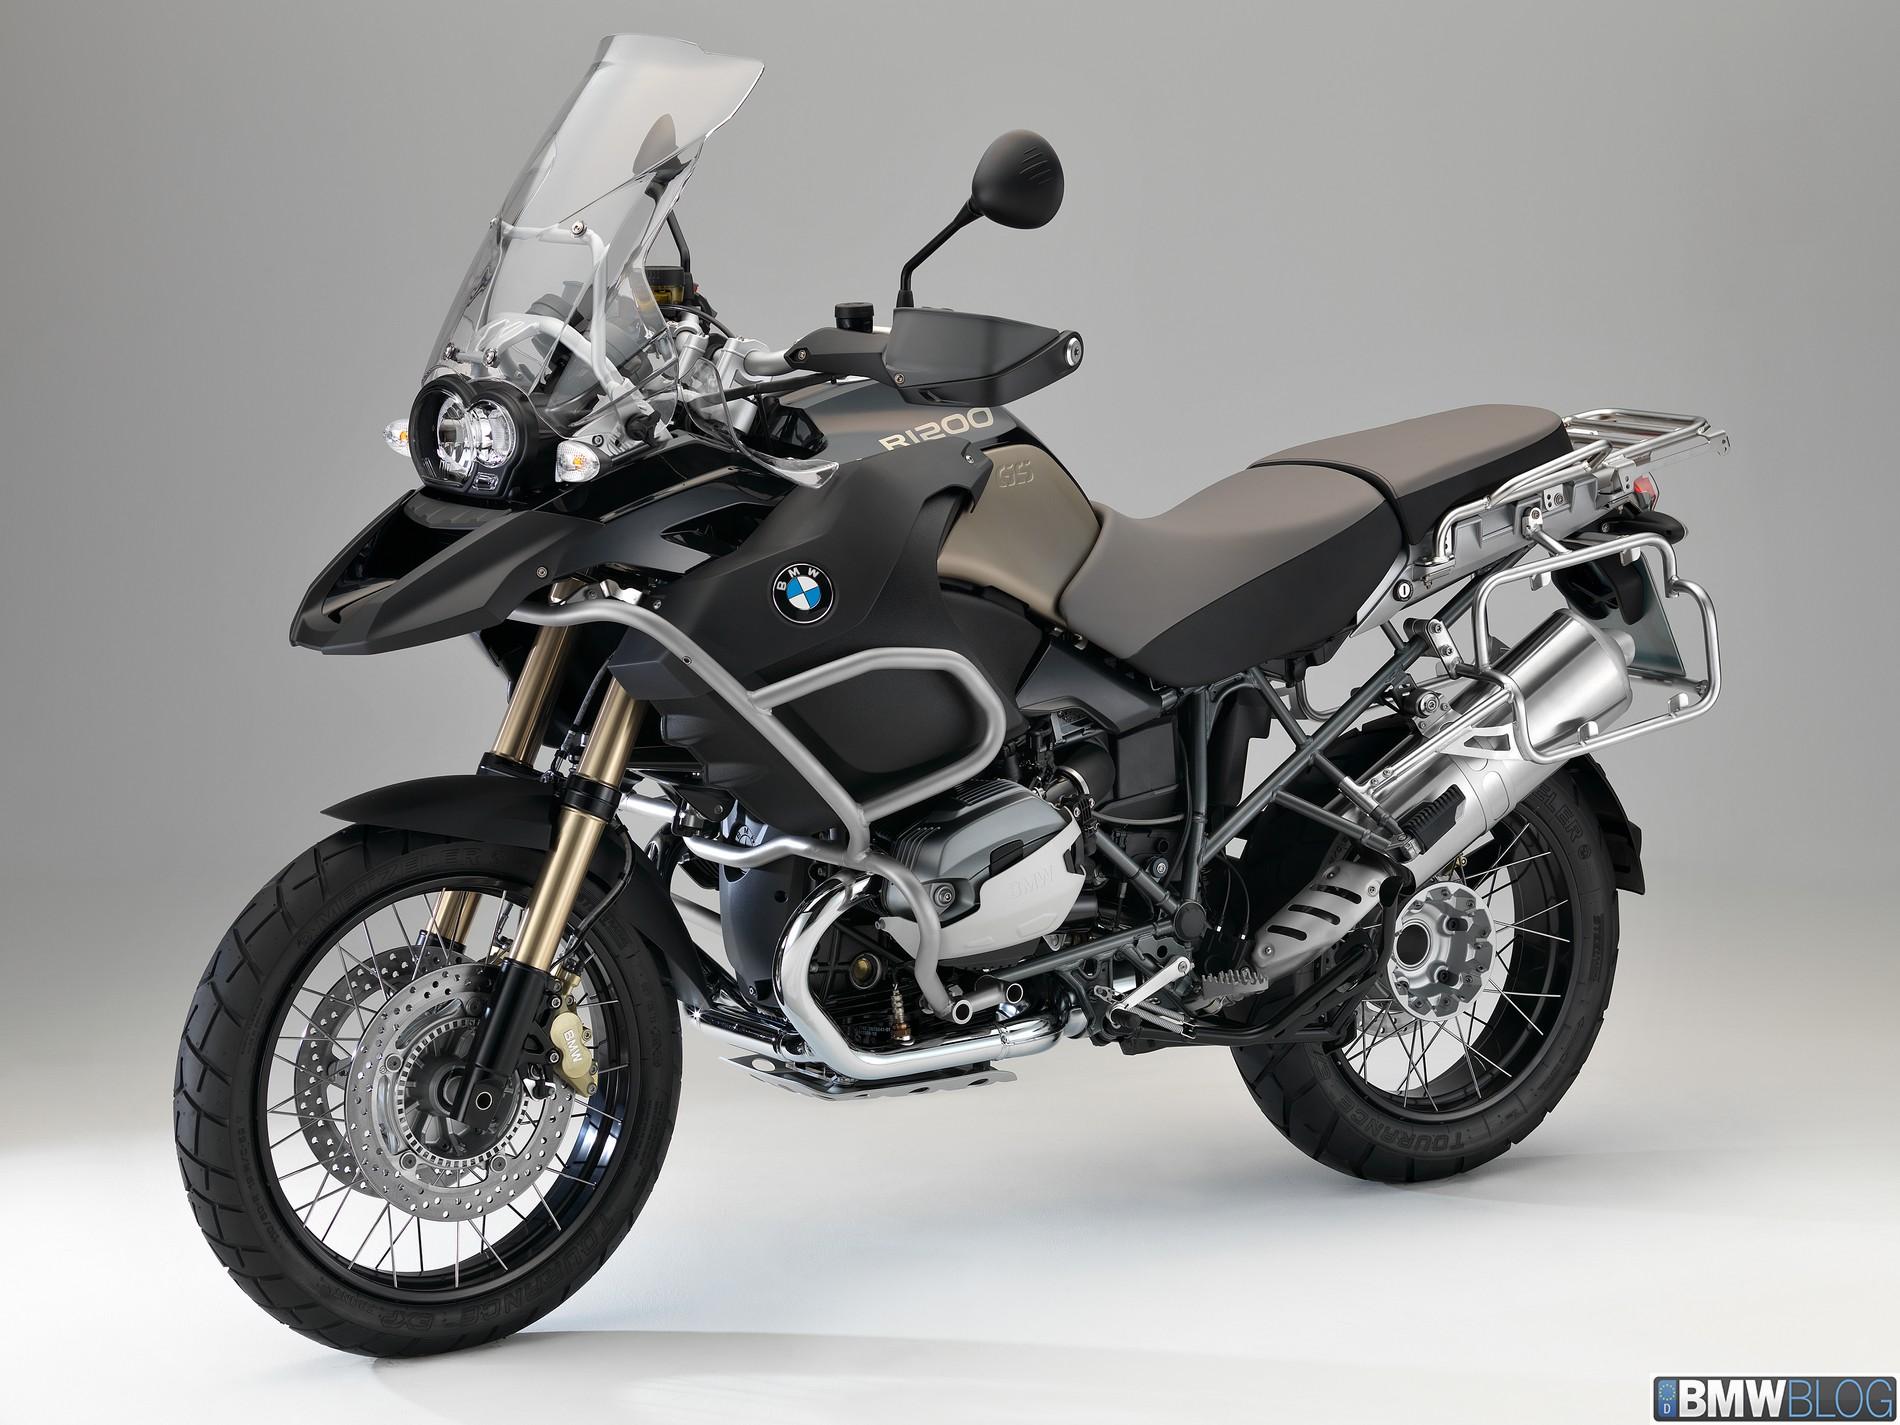 The Quot 90 Jahre Bmw Motorrad Quot Special Models